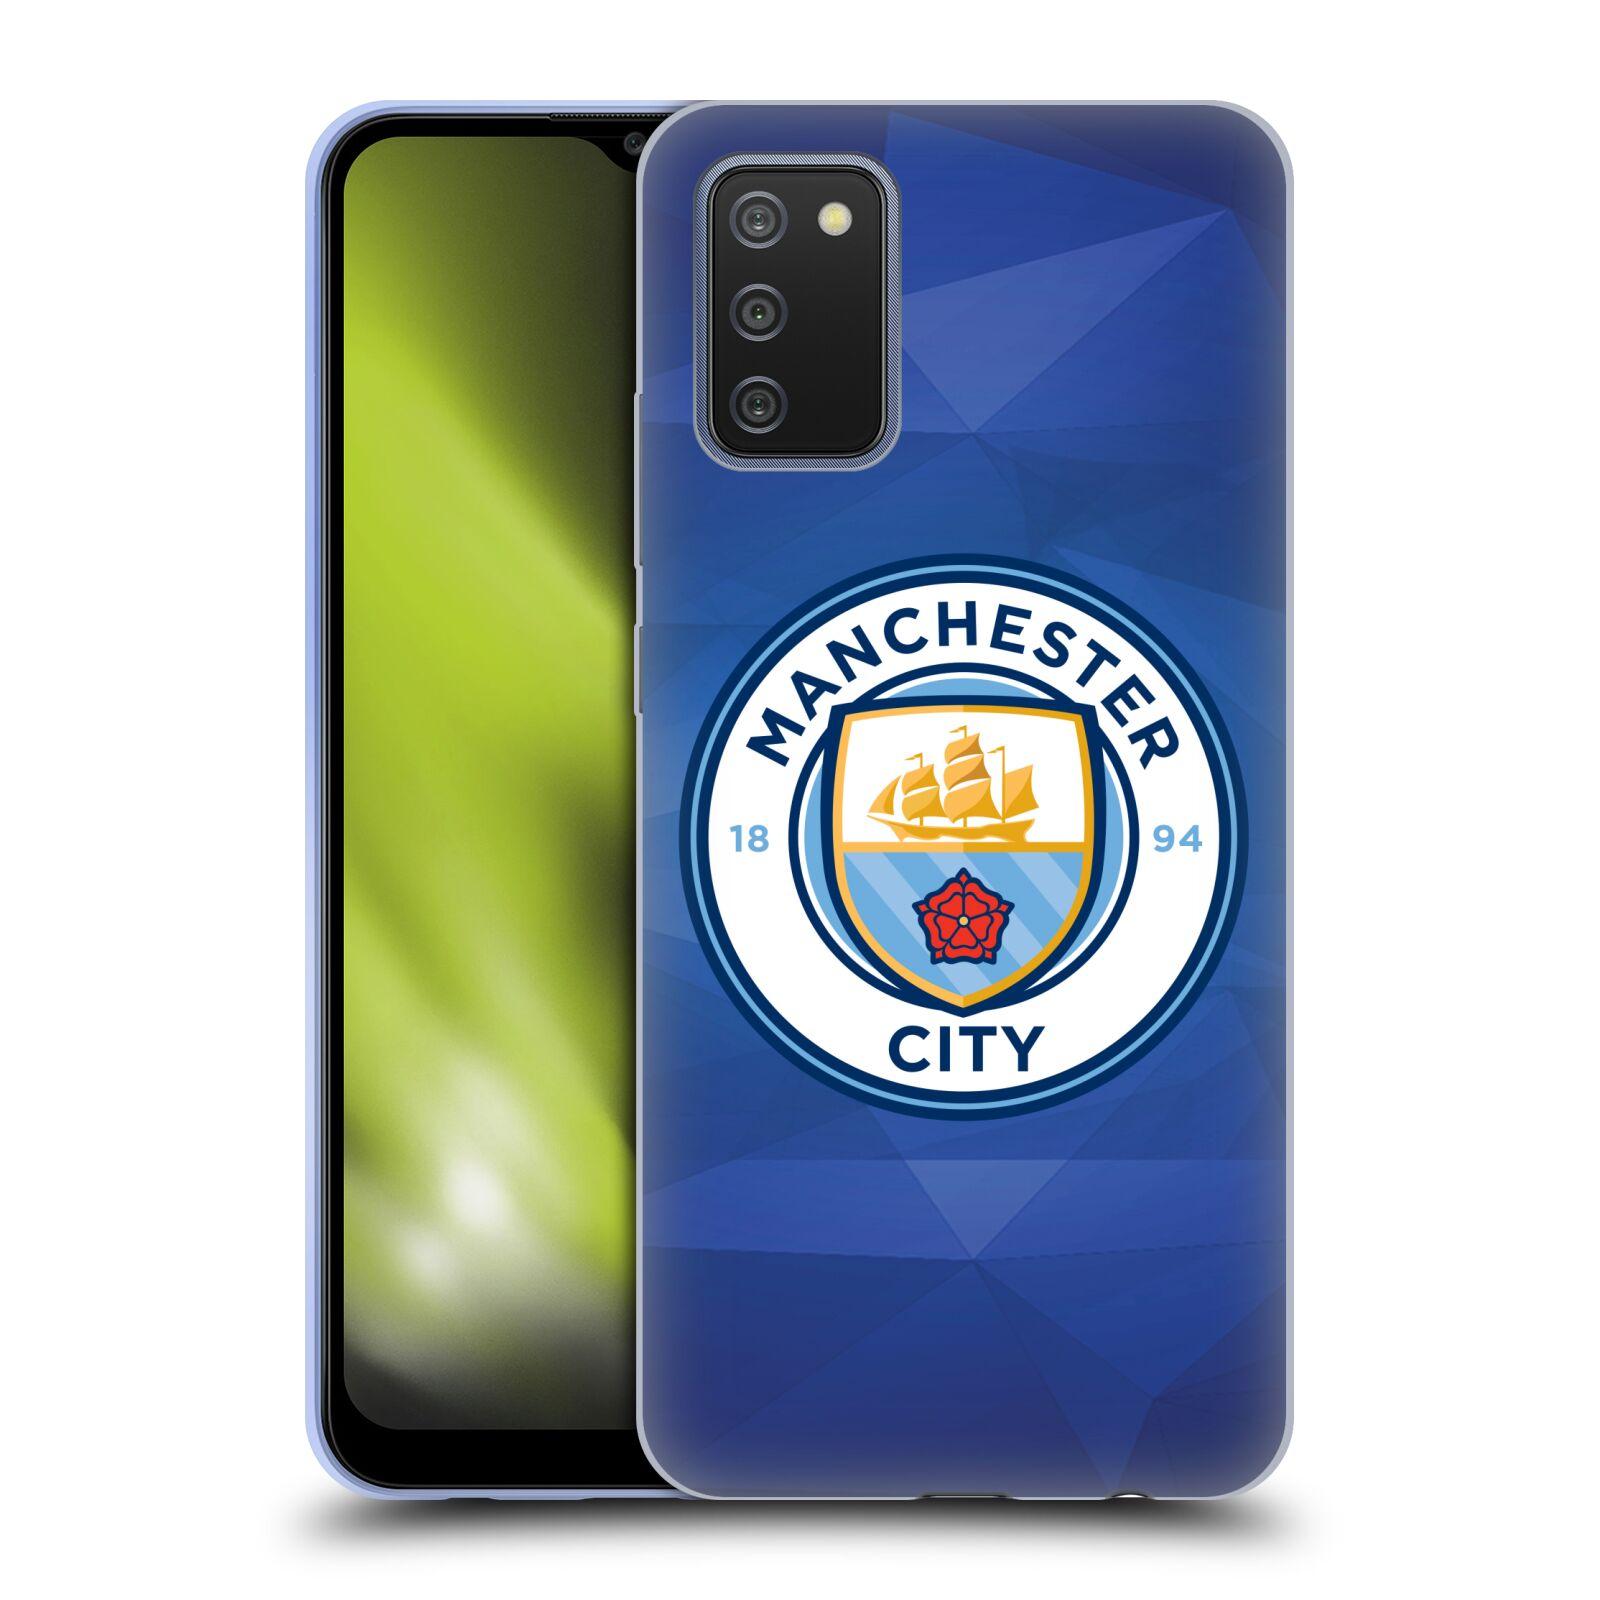 Silikonové pouzdro na mobil Samsung Galaxy A02s - Head Case - Manchester City FC - Modré nové logo